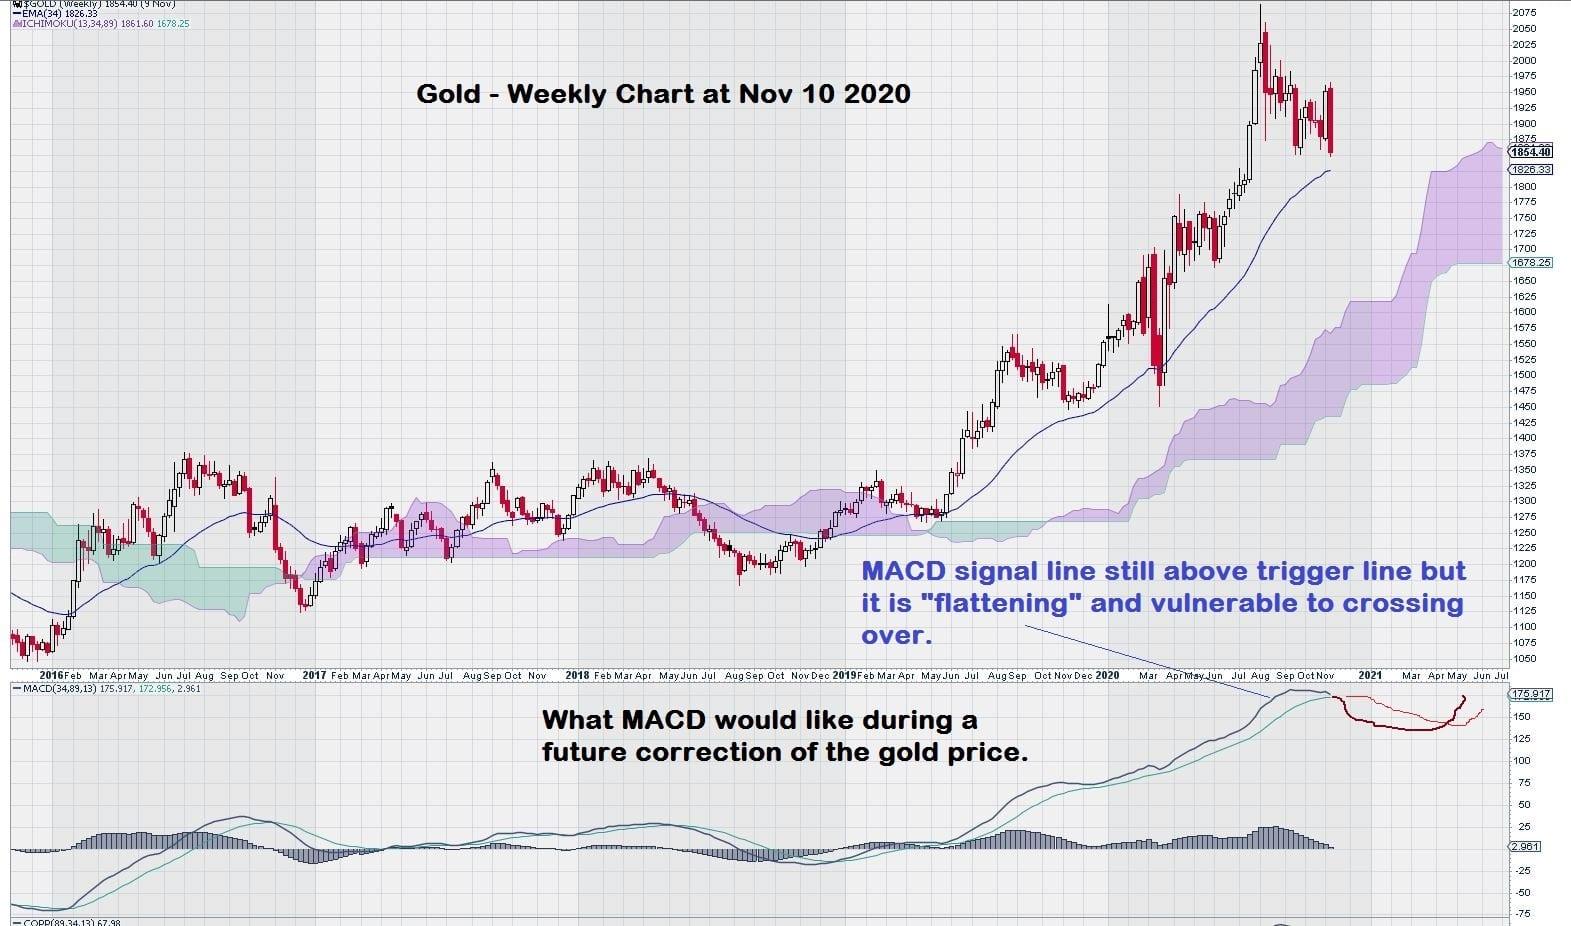 Gold Price Chart MACD Analysis weekly November 2020